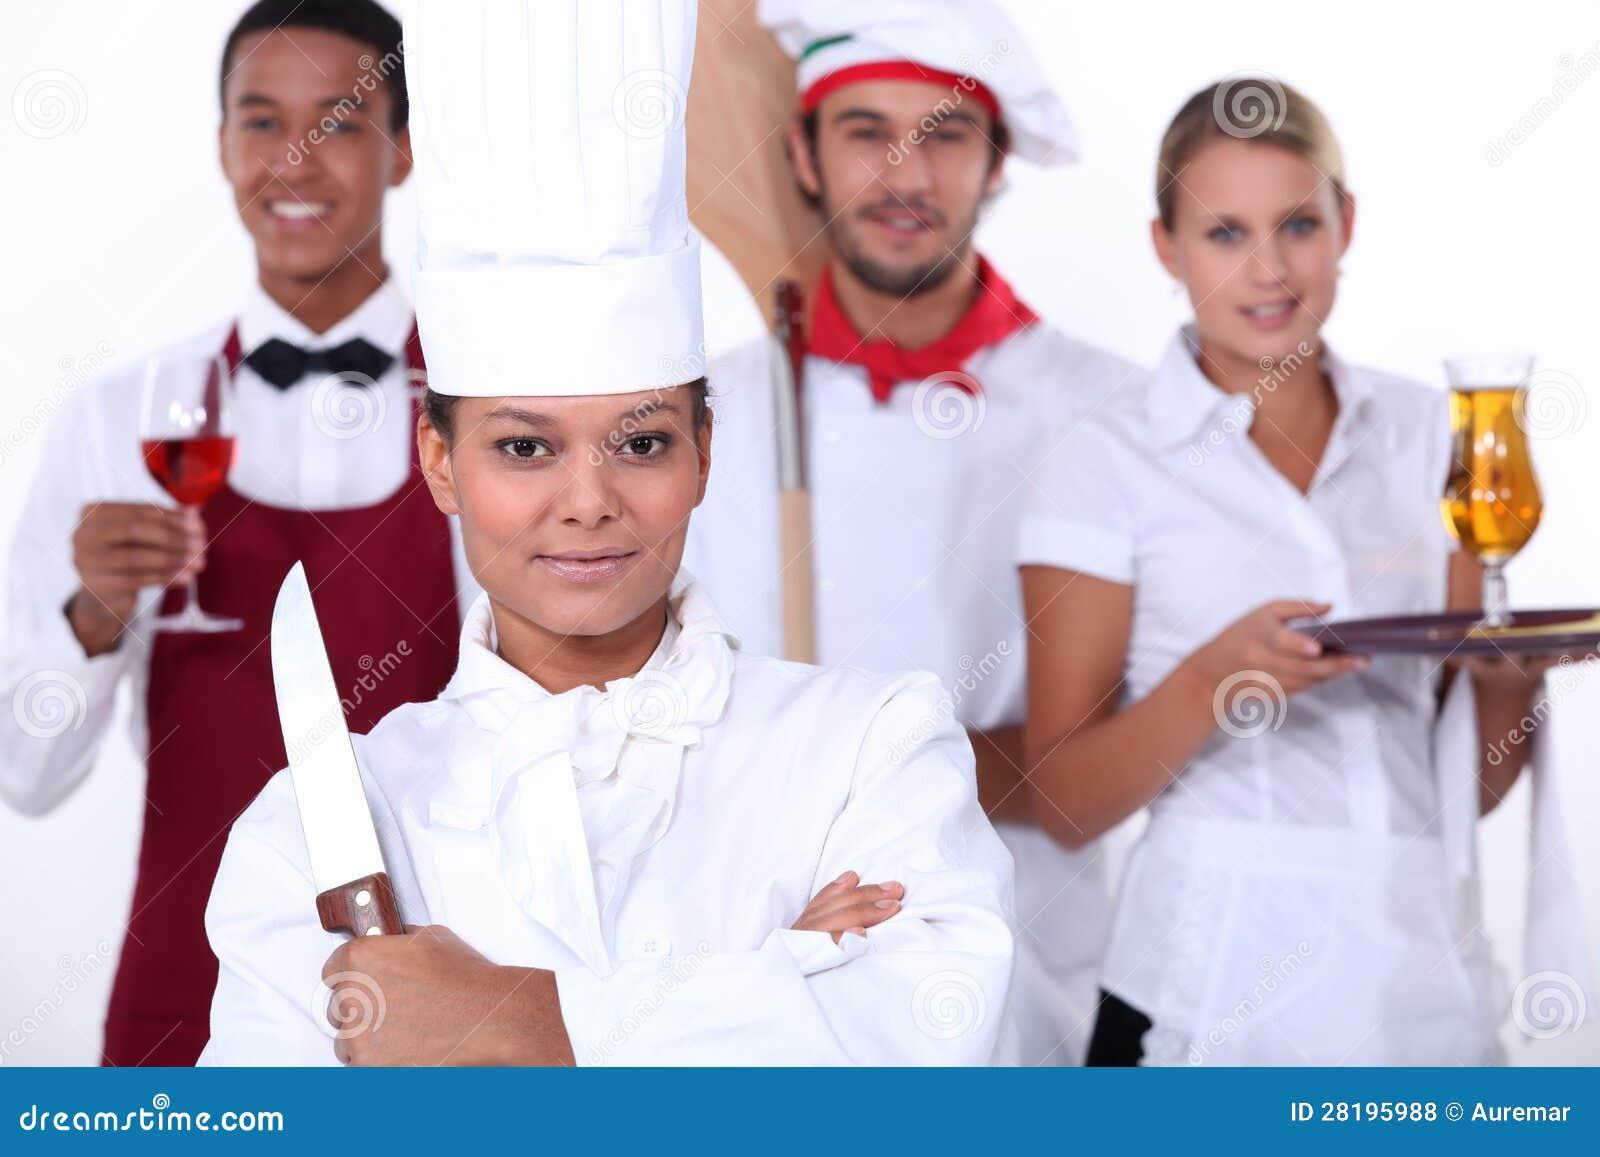 Restaurant Staff Stock Photo Image Of Happy Apron Four